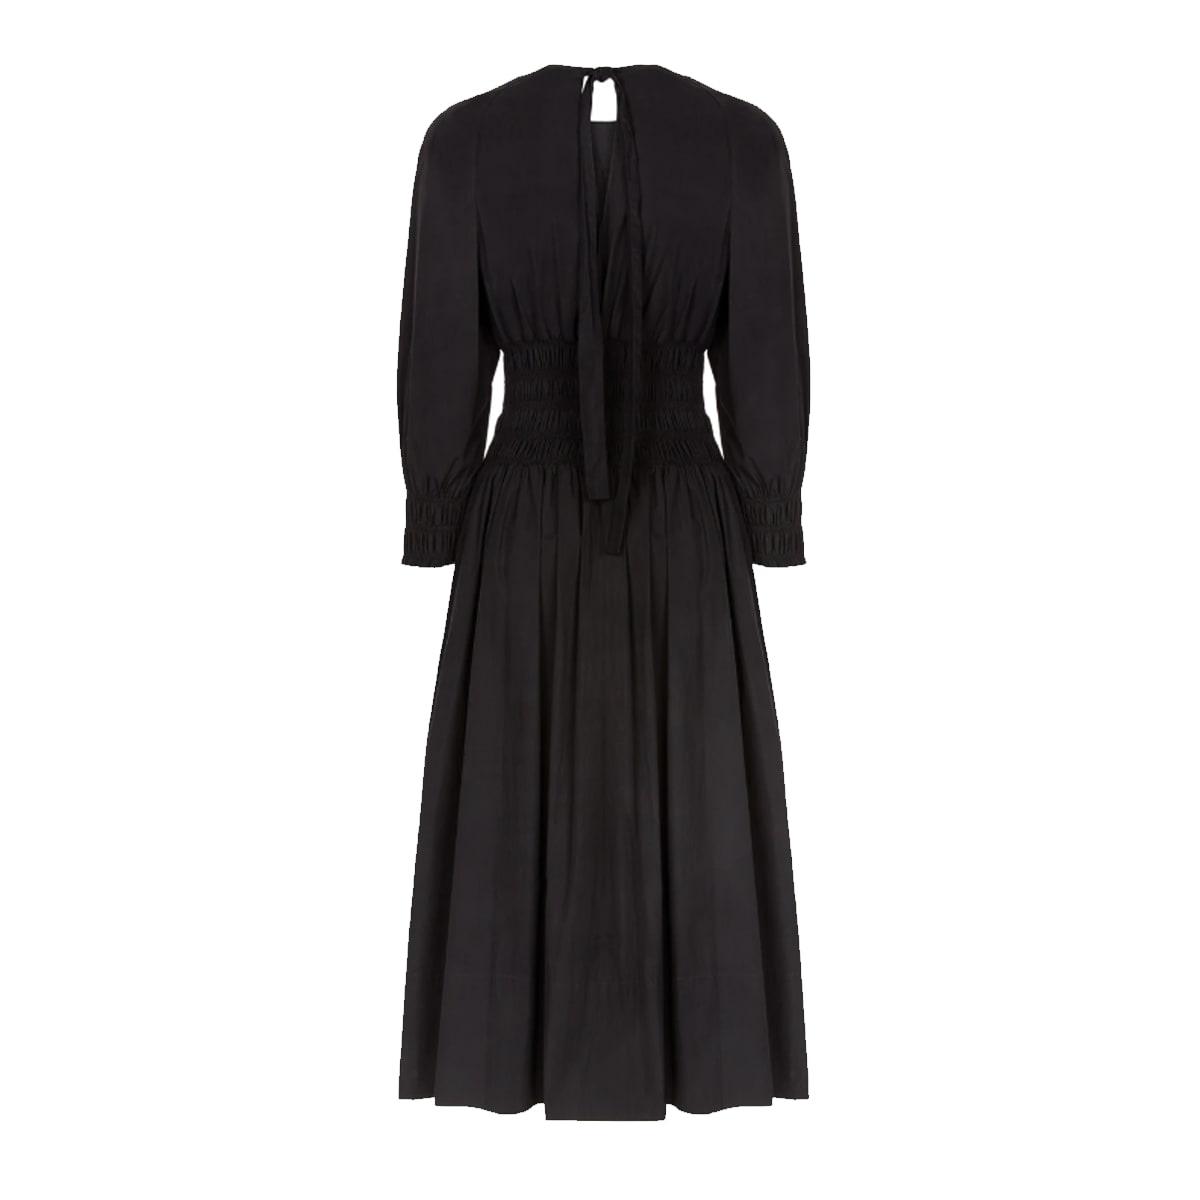 Arianna shirred poplin midi dress